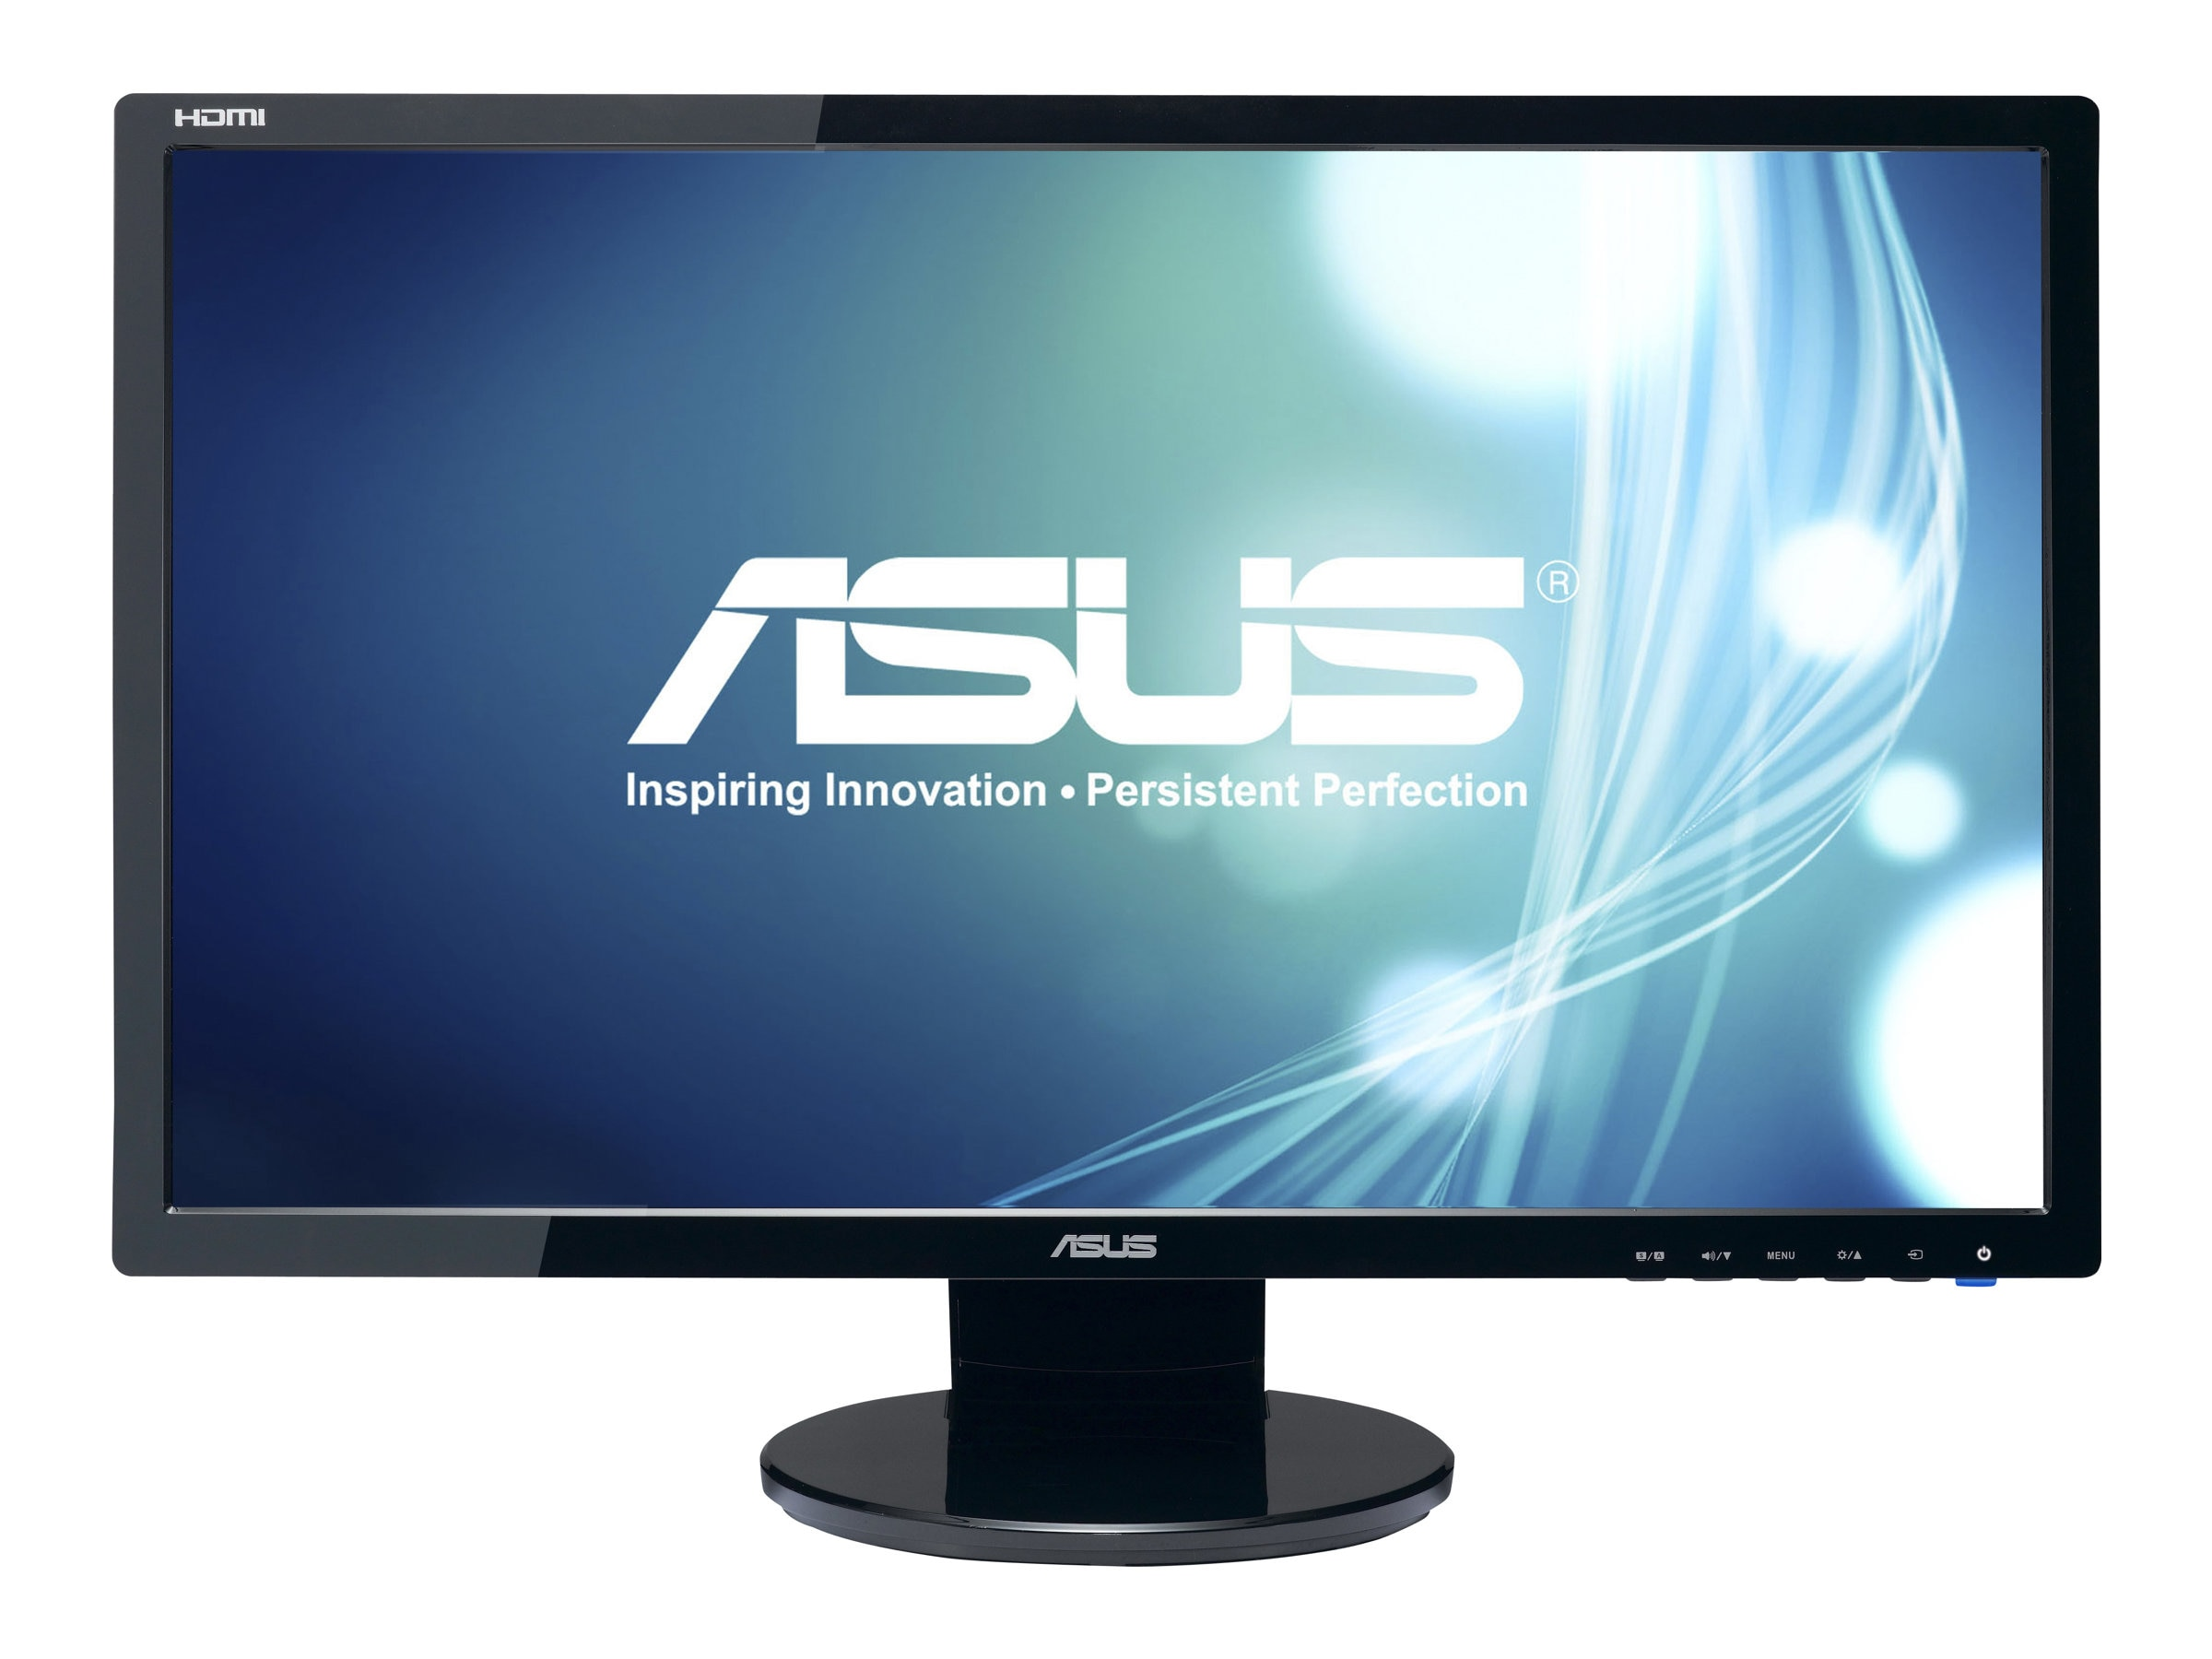 Asus 22 VE228H Full HD LED-LCD Monitor, Black, VE228H, 11932882, Monitors